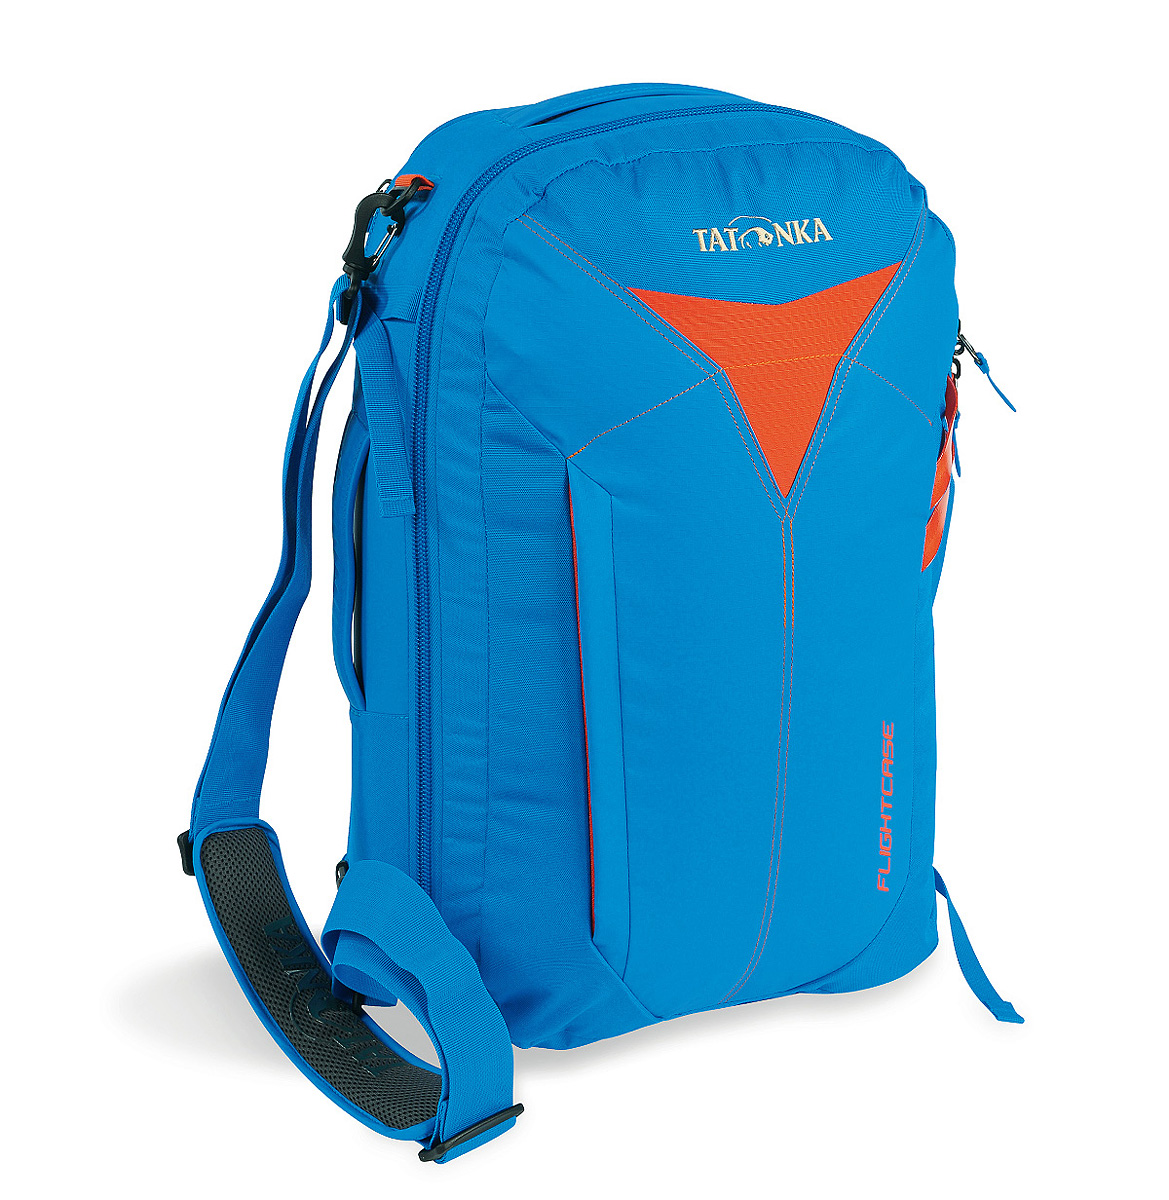 Сумка-рюкзак для путешествий Tatonka Flightcase, цвет: ярко-синий, 38 л сумка дорожная tatonka squeezy duffle